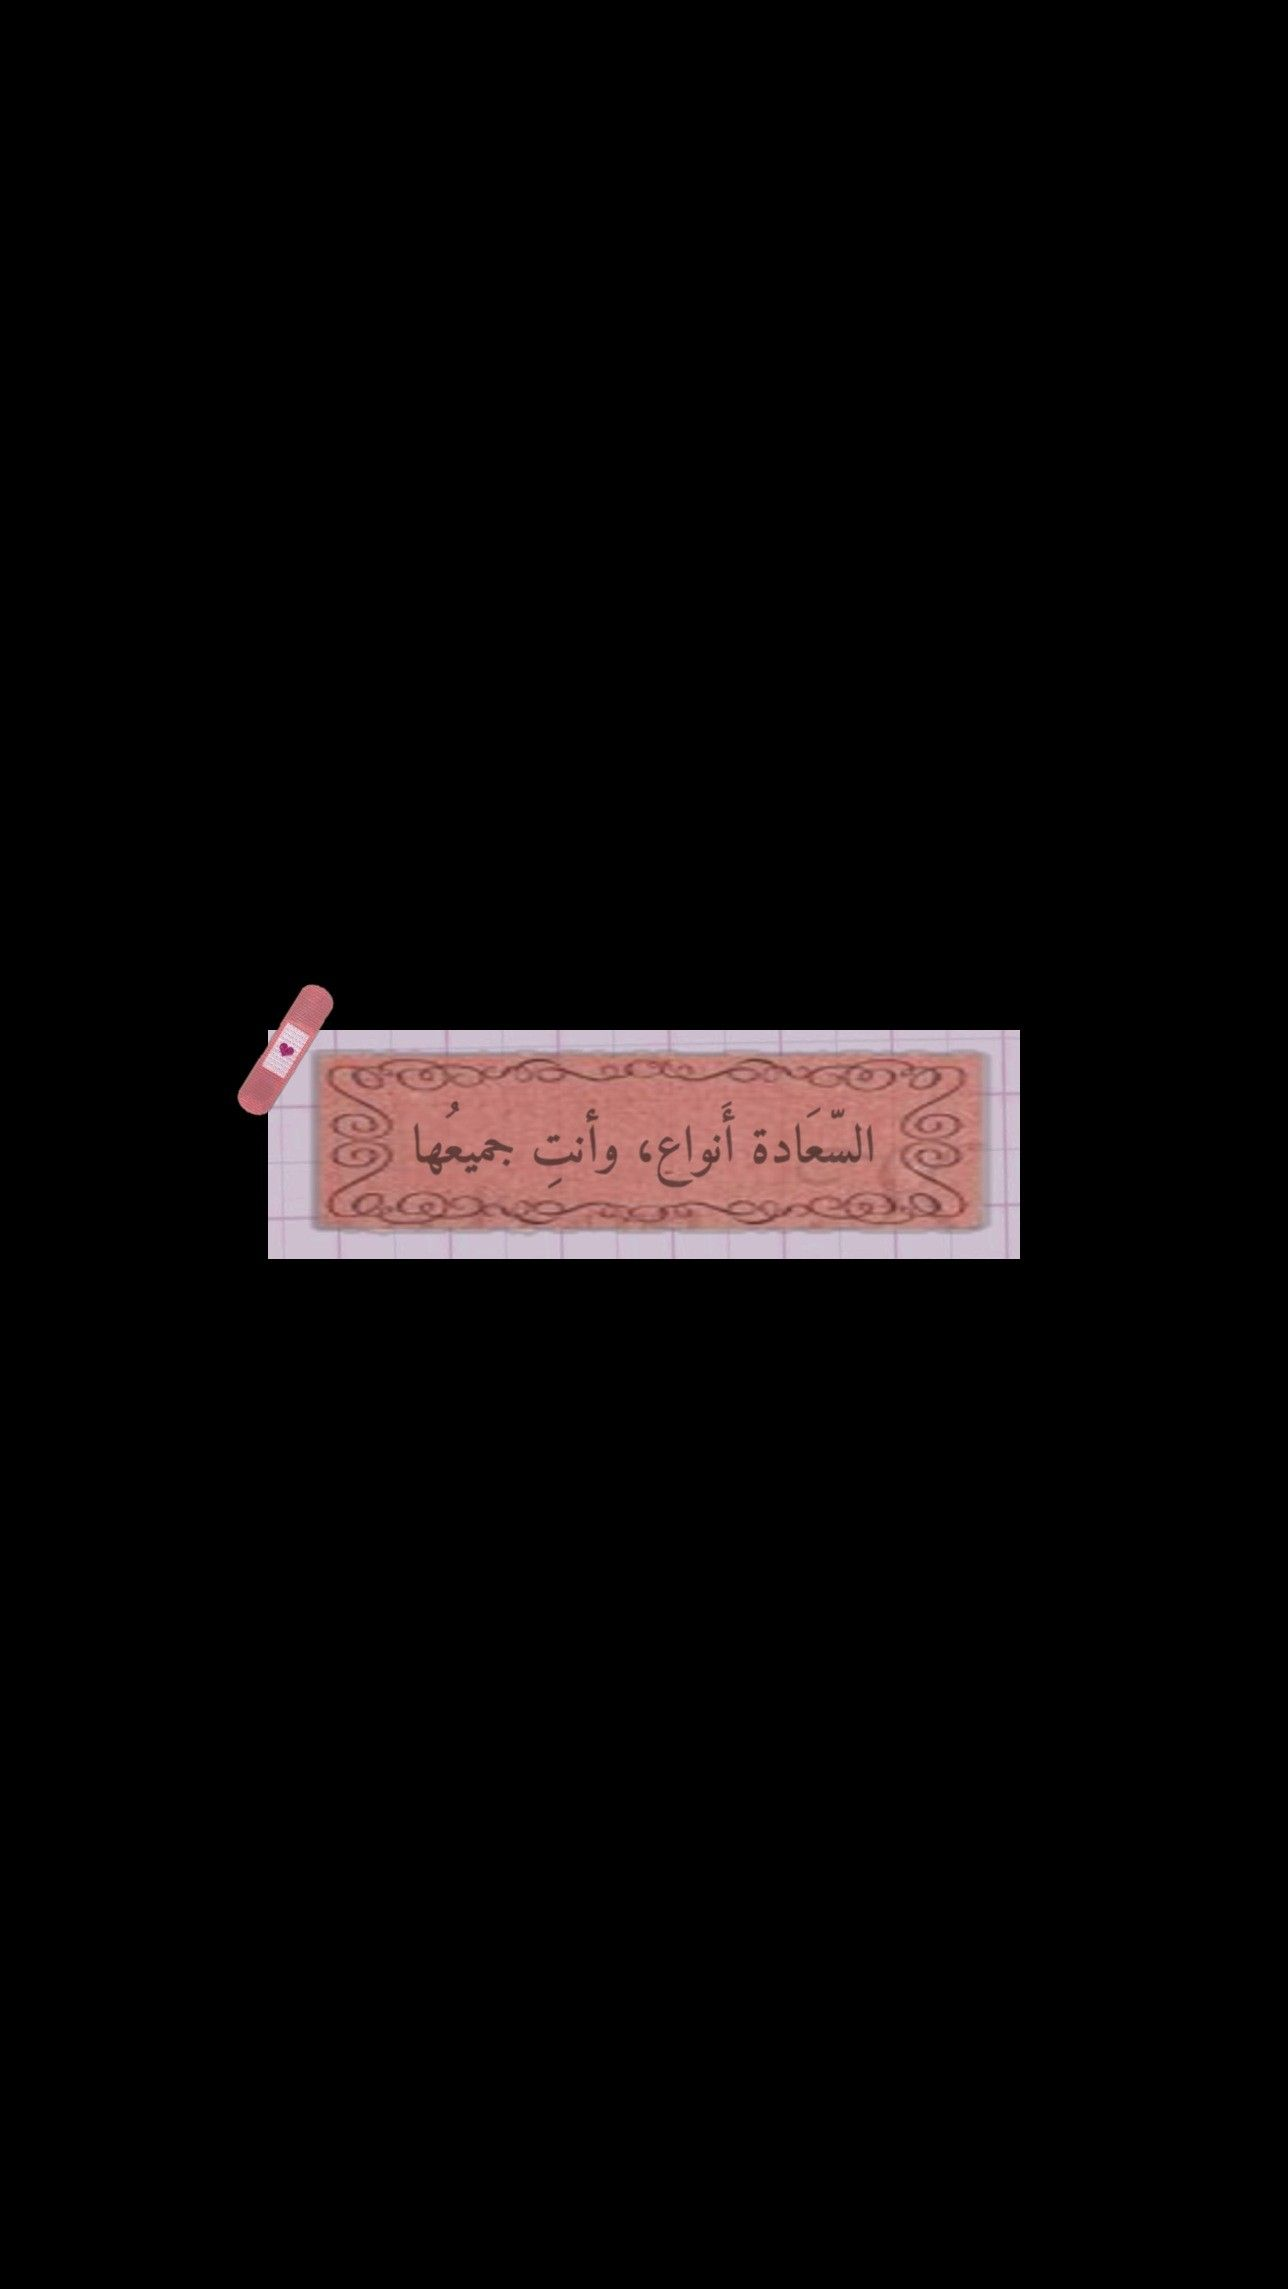 اقتباسات تليجرام تمبلر ستوري Beautiful Arabic Words Happy Wallpaper Quran Quotes Inspirational